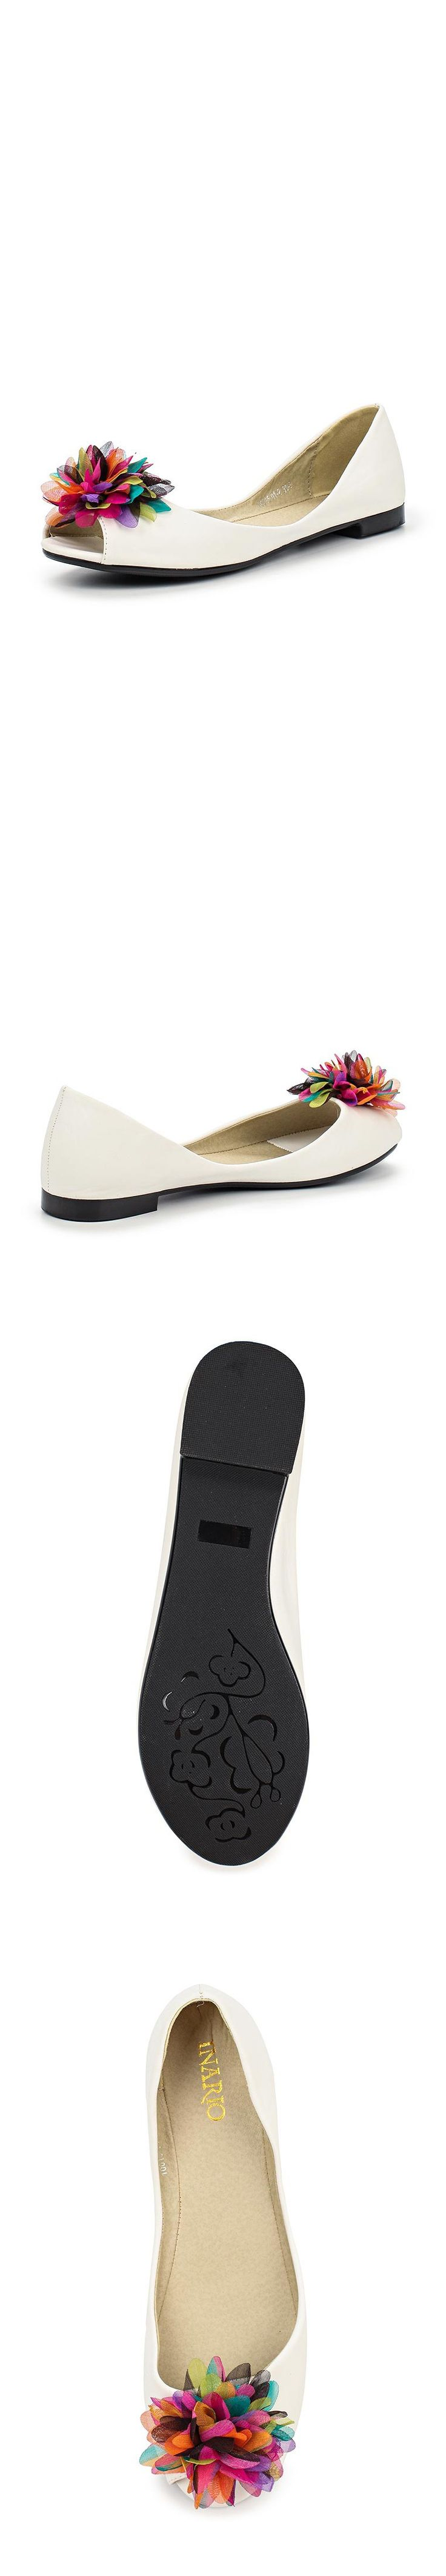 Женская обувь балетки Inario за 3399.00 руб.